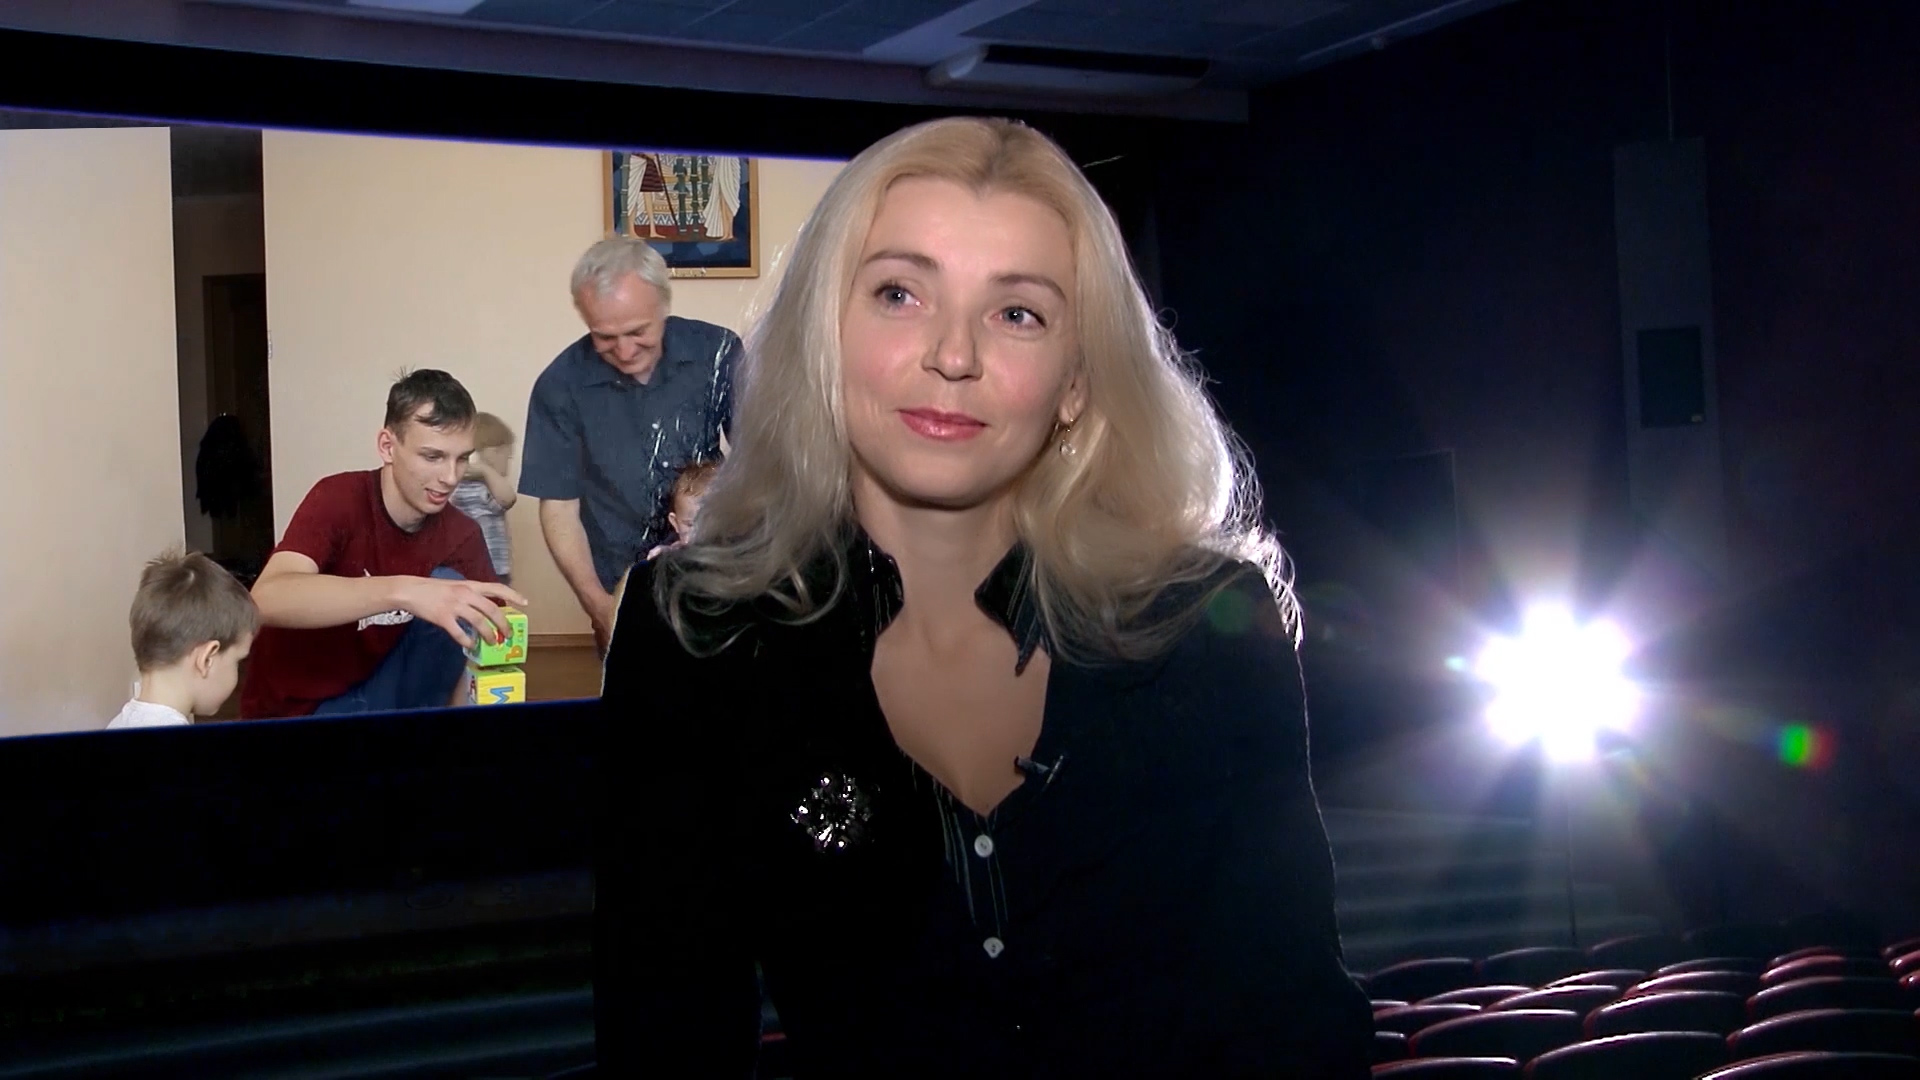 film director anna barsukova #annabarsukova #youarenotalone #аннабарсукова #тынеодин #movie #film